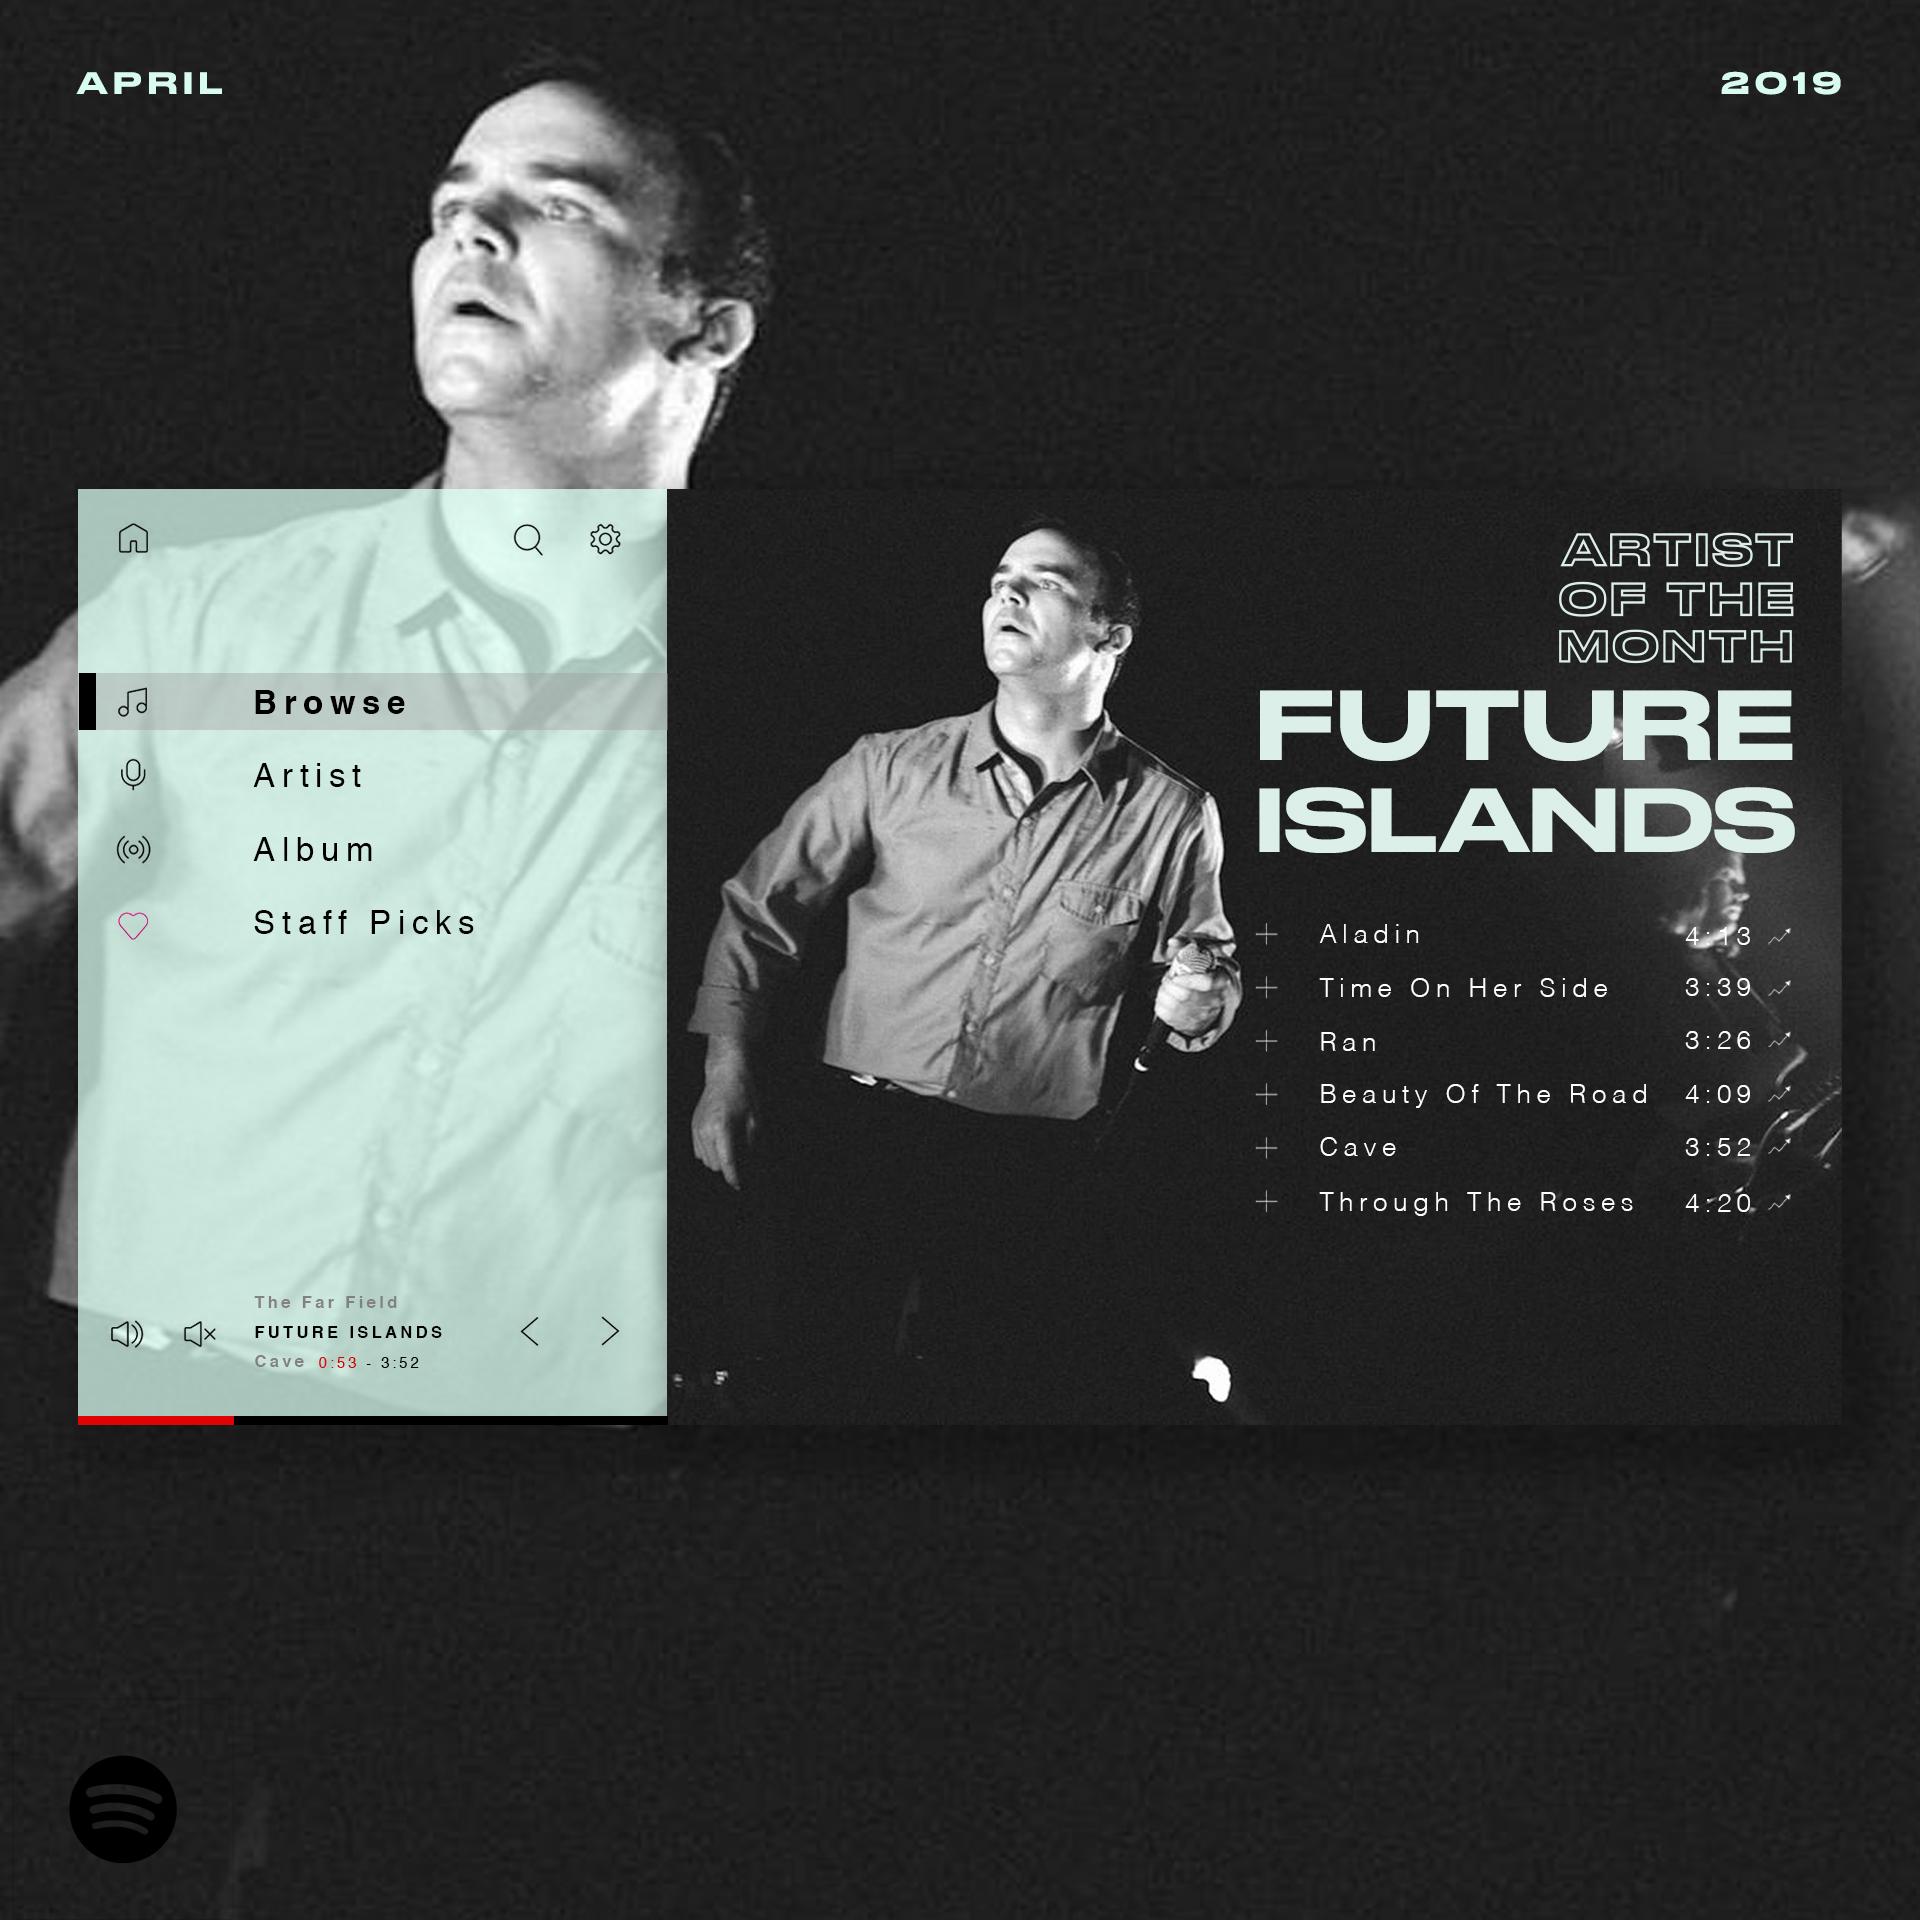 Future_islands_UX_IG.jpg